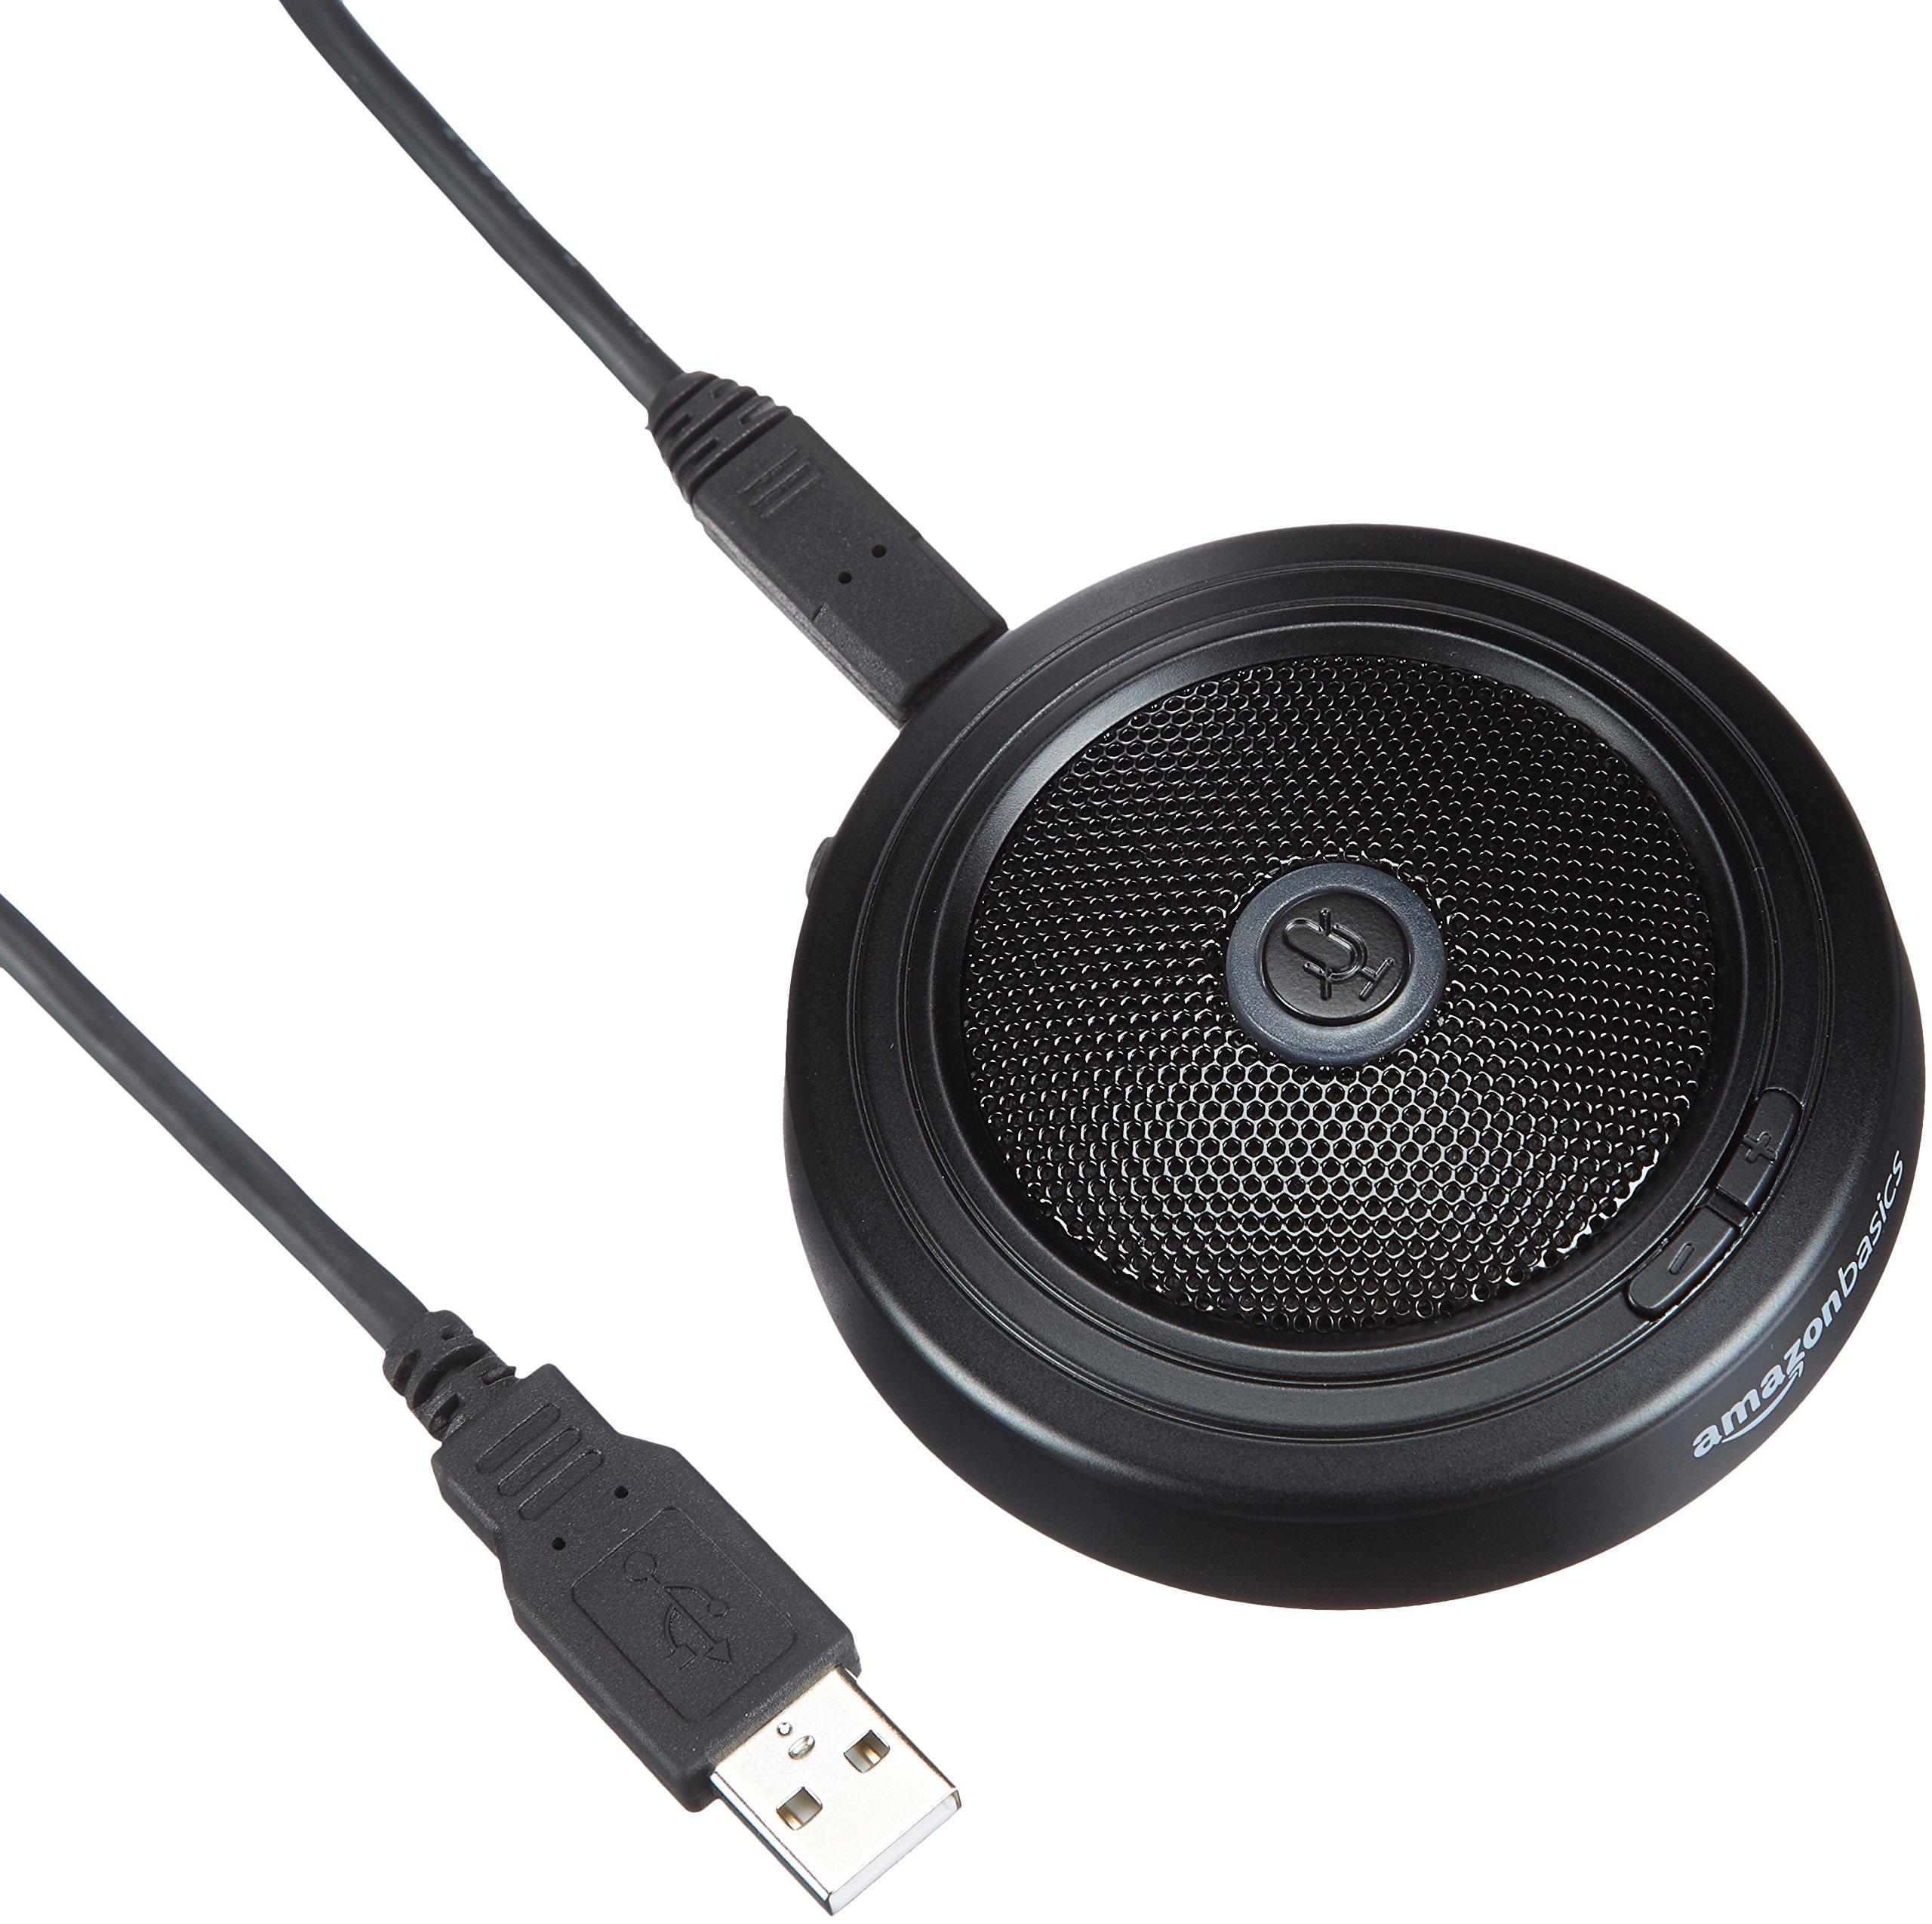 AmazonBasics LJ USM 001 USB Conference Microphone